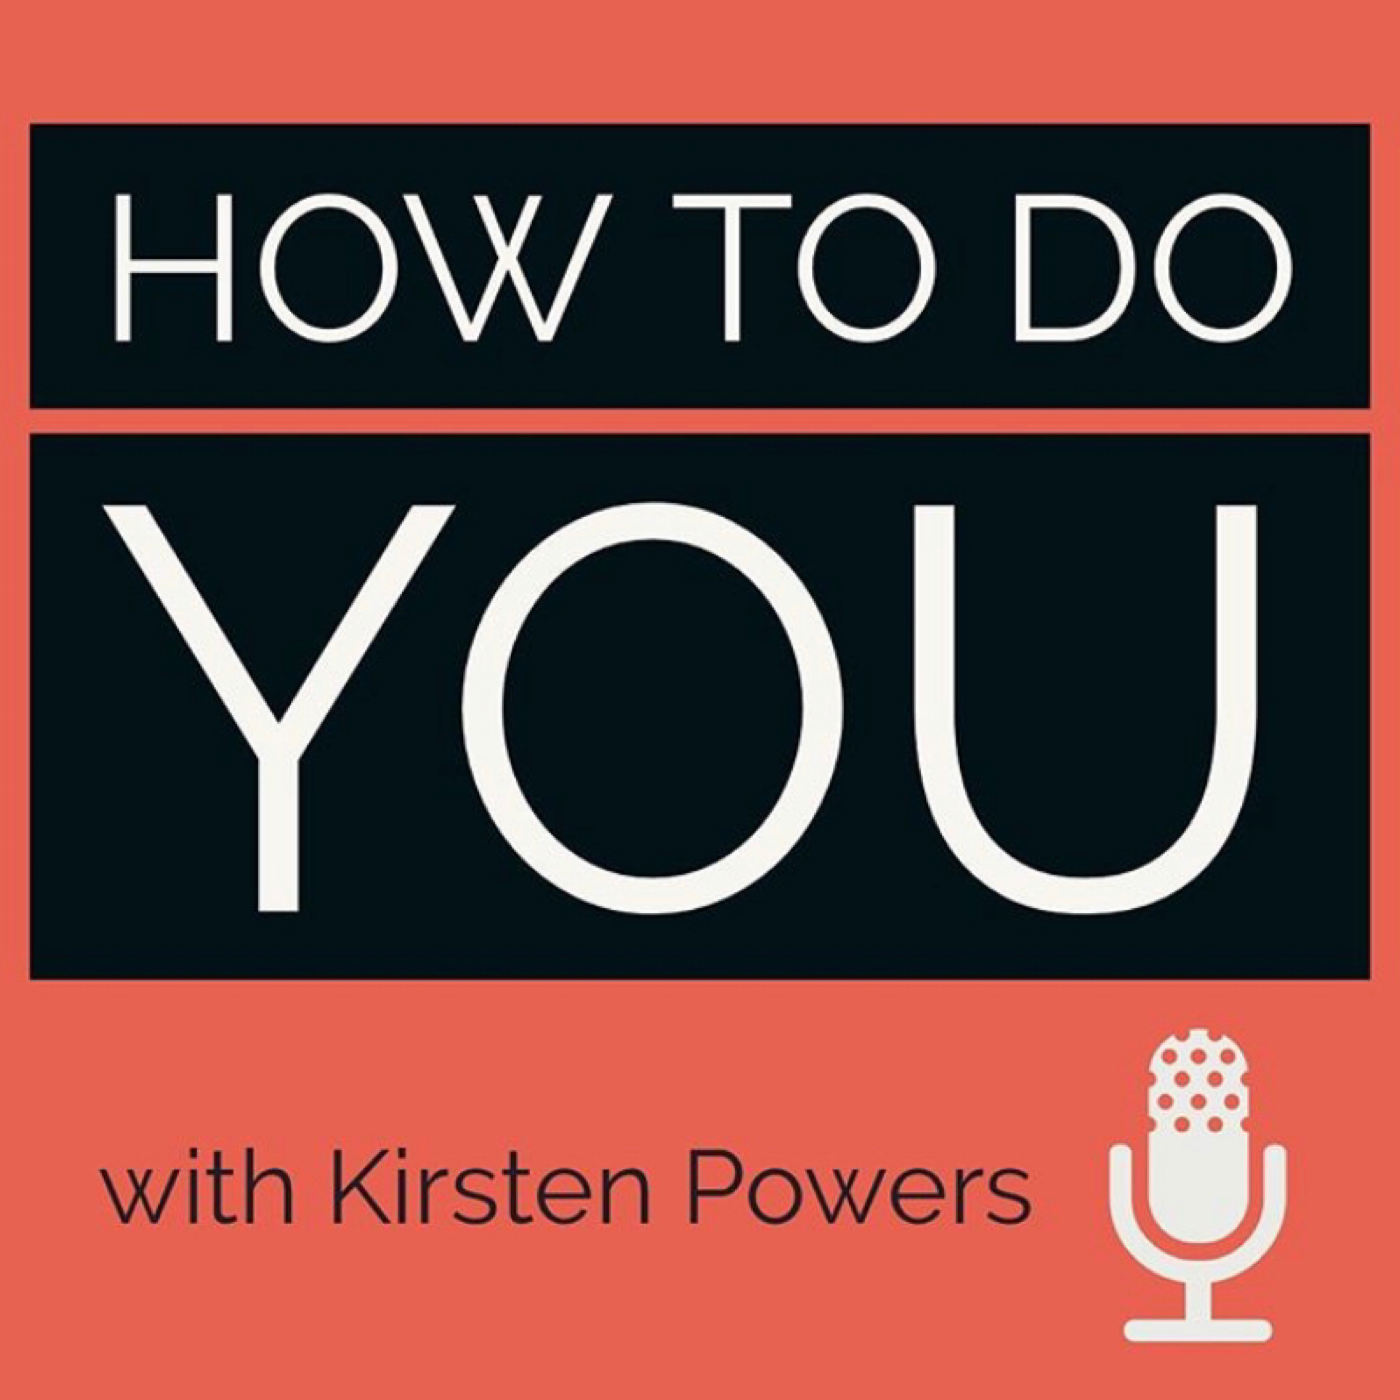 The Gift of Forgiveness with Katherine Schwarzenegger Pratt